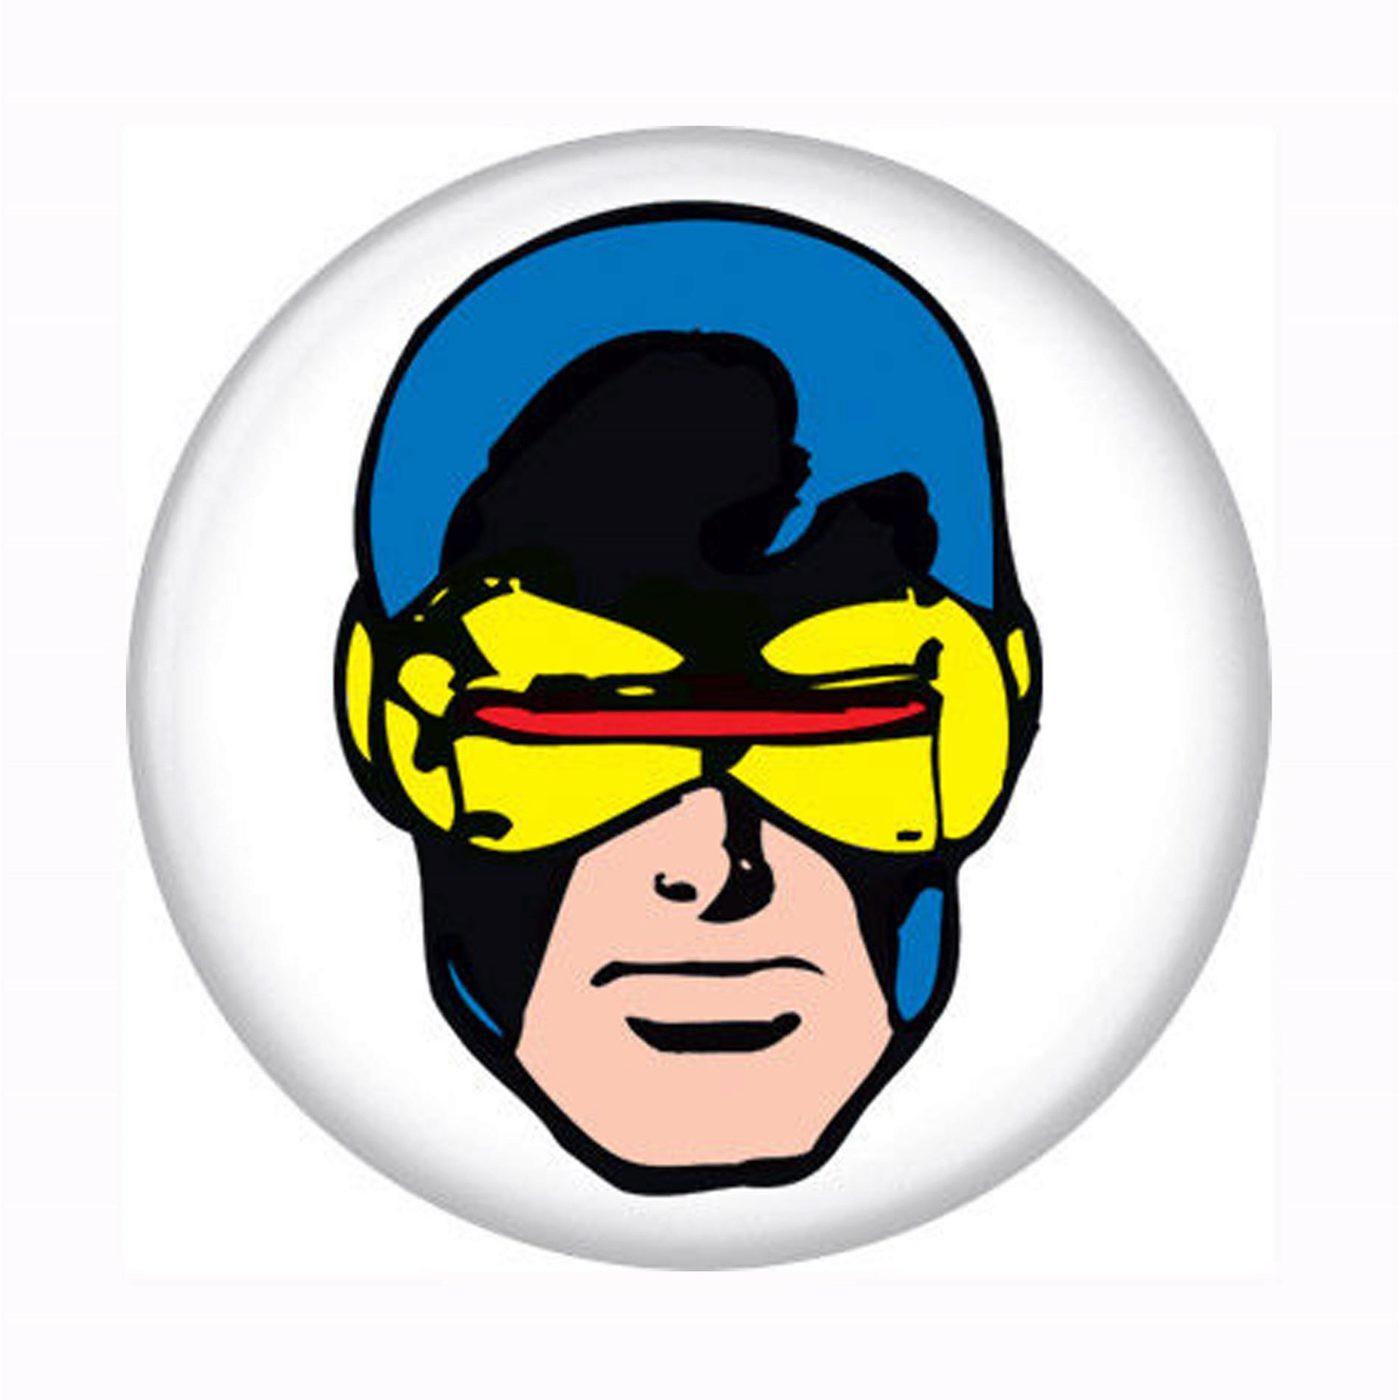 X-Men Cyclops Head Button